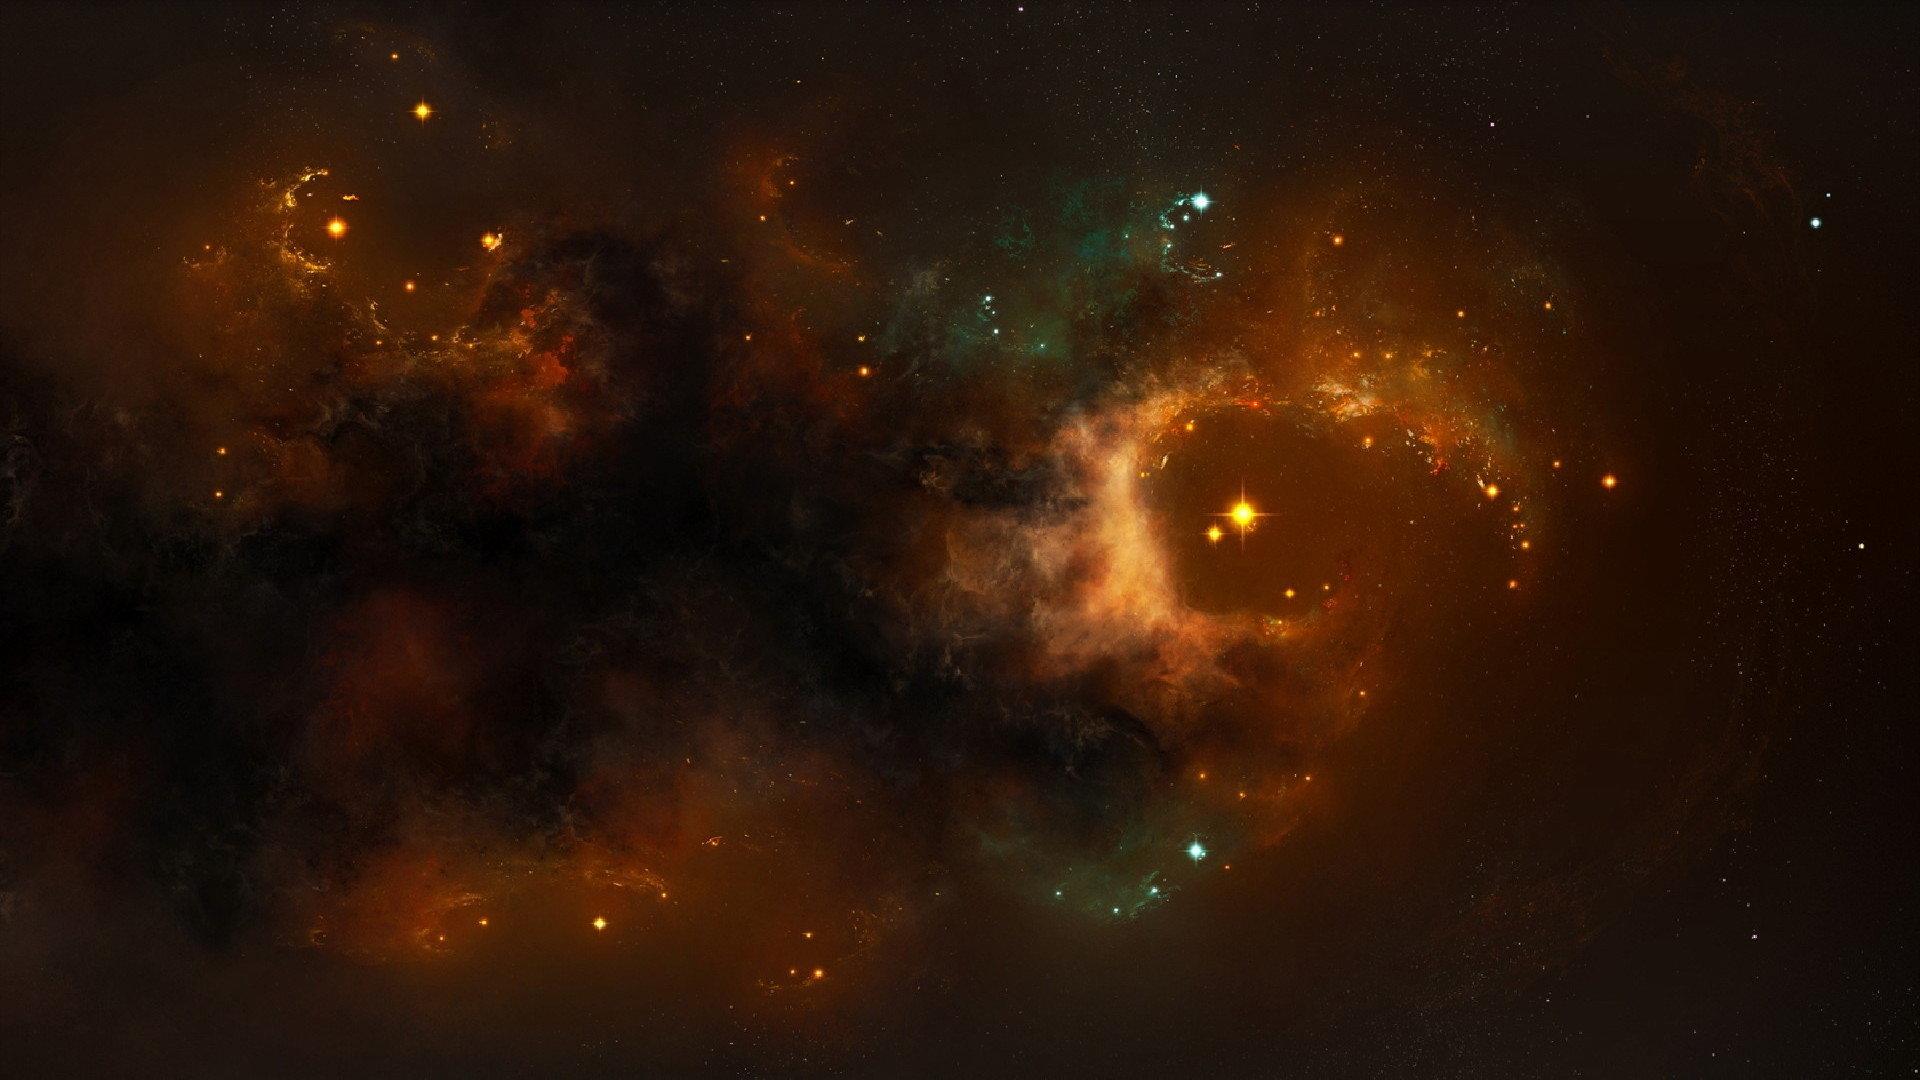 Space wallpapers 1920x1080 full hd 1080p desktop backgrounds - 1080p nebula wallpaper ...